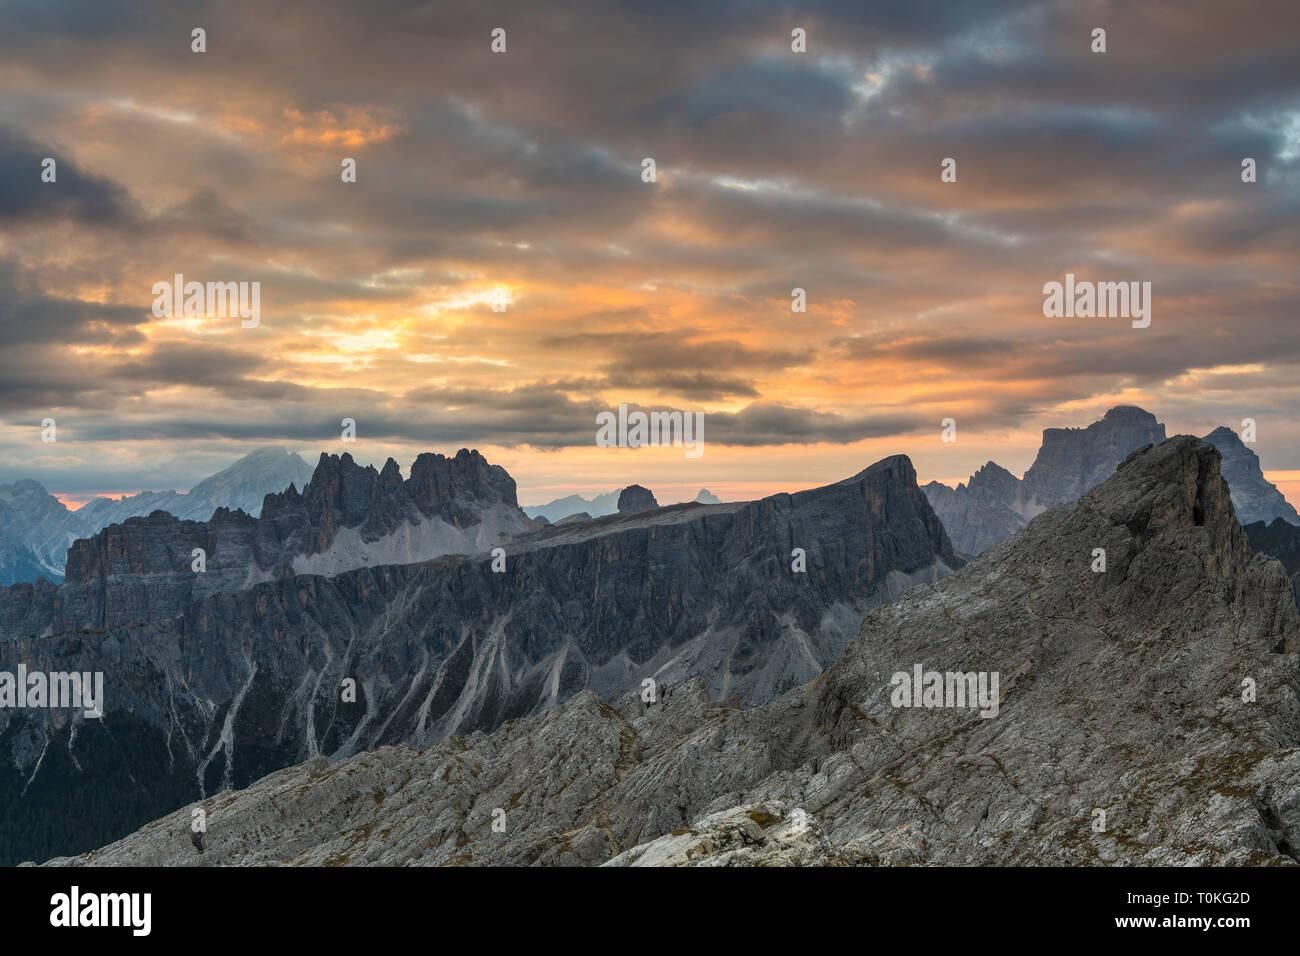 Lever du soleil dans les Dolomites au Rifugio Nuvolau surplombant Croda da Lago, Italie Banque D'Images